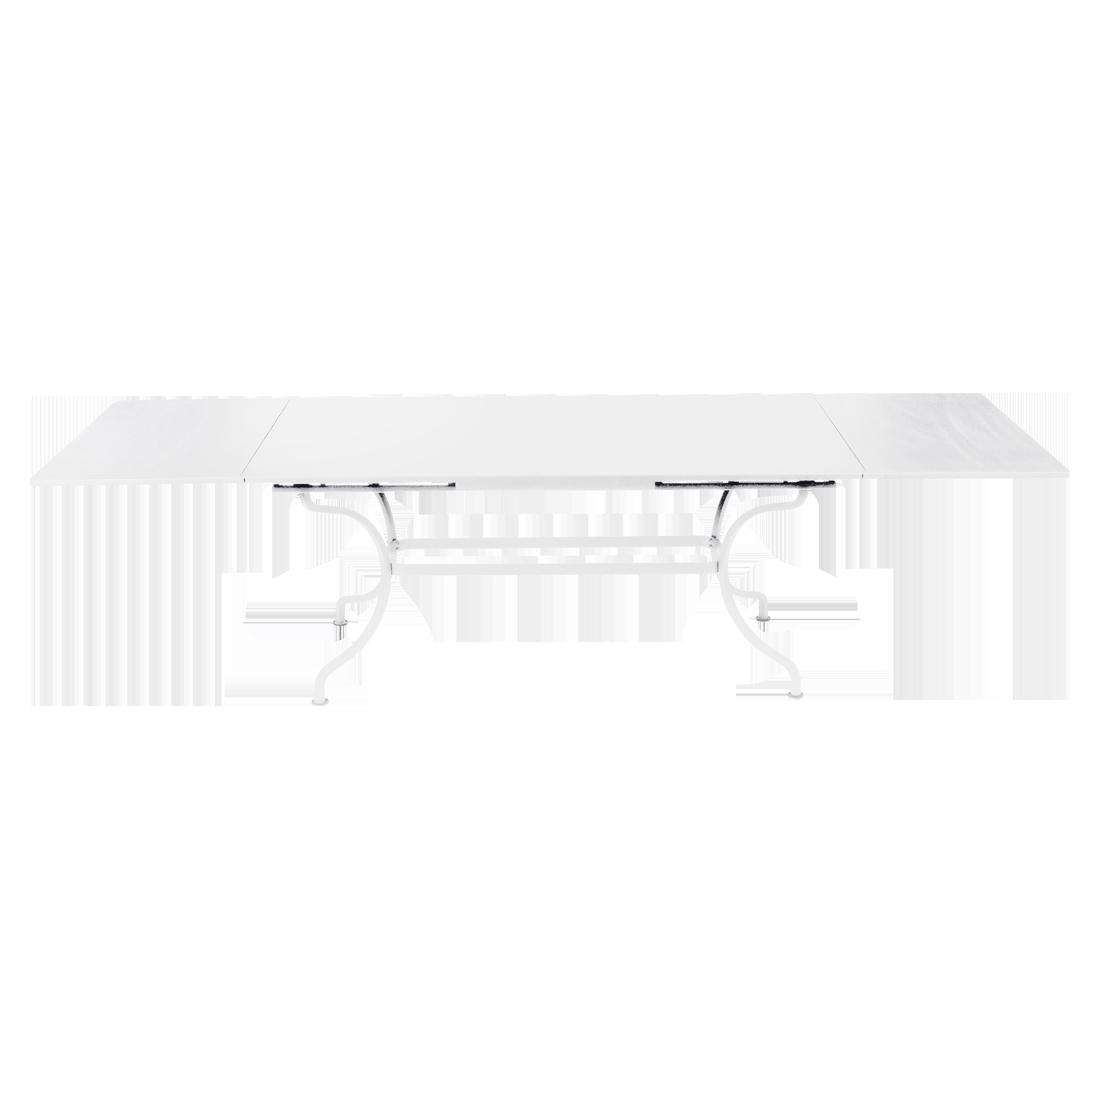 table de jardin a allonge, table metal rallonge, grande table rectangulaire, grande table blanche